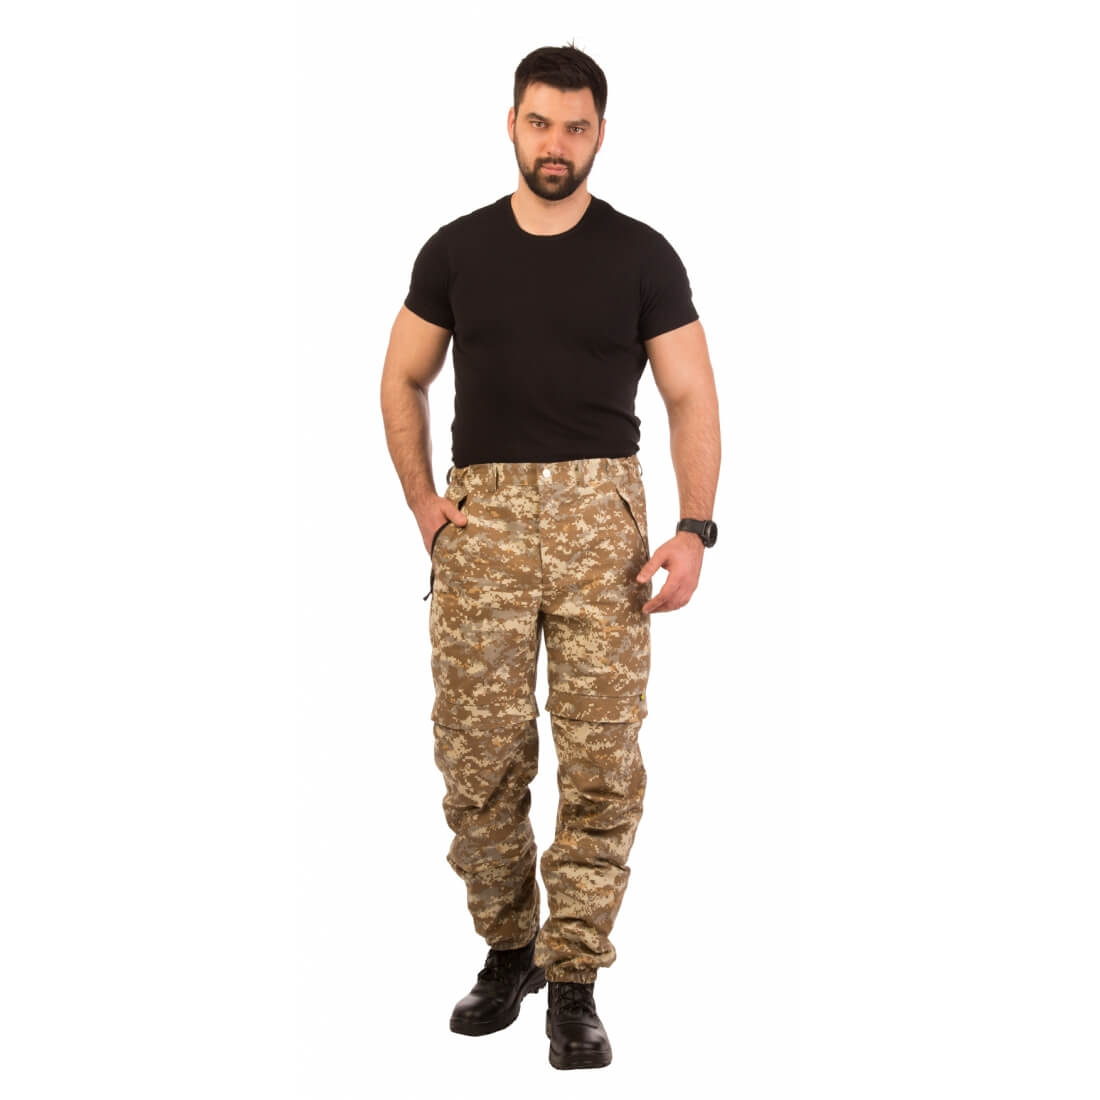 Мужской противоэнцефалитный костюм Биостоп® Лайт